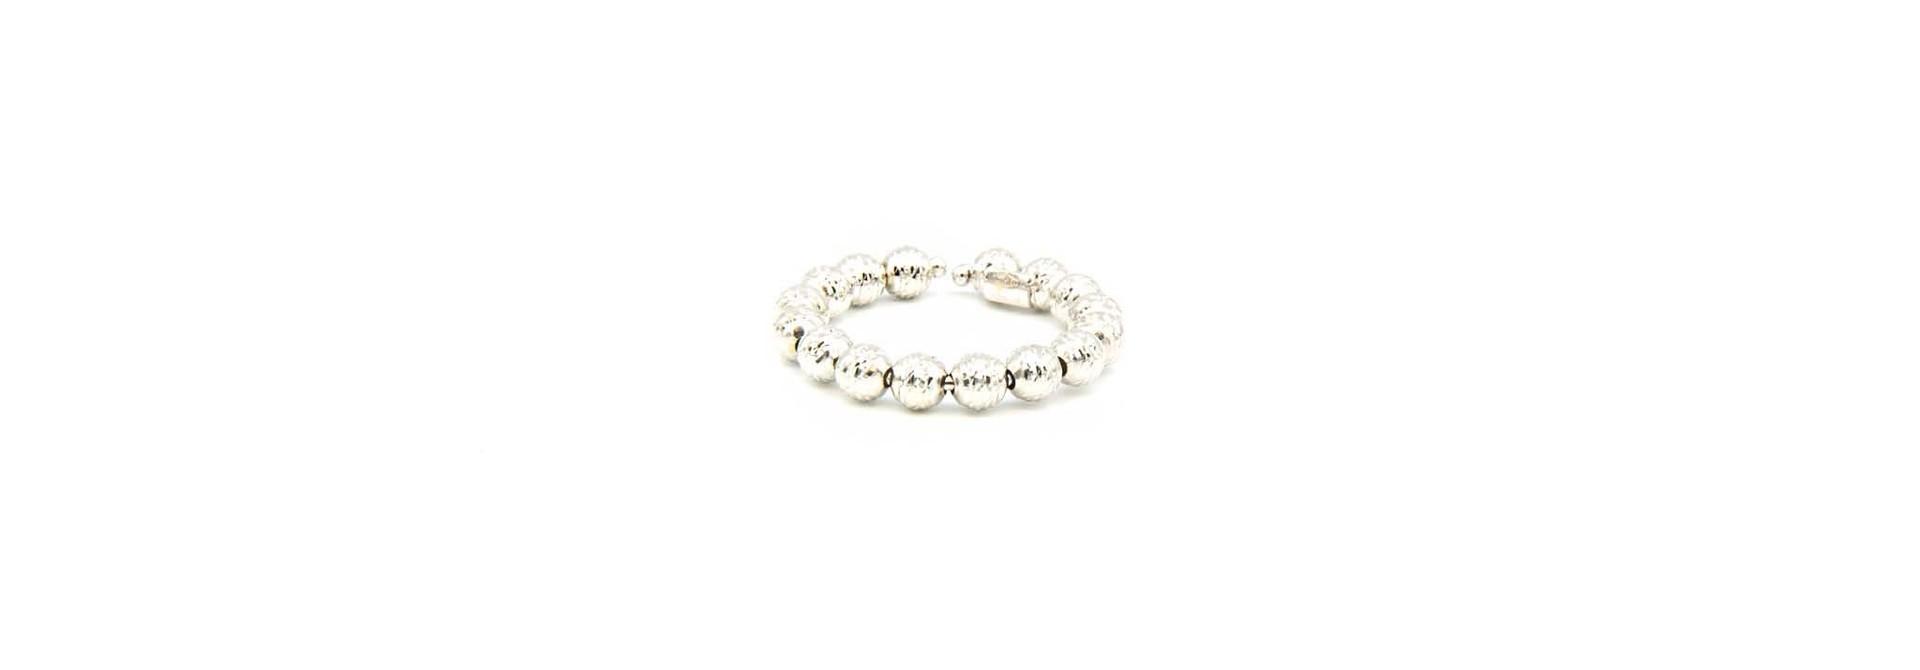 Ring witgoud met diamond cut balletjes